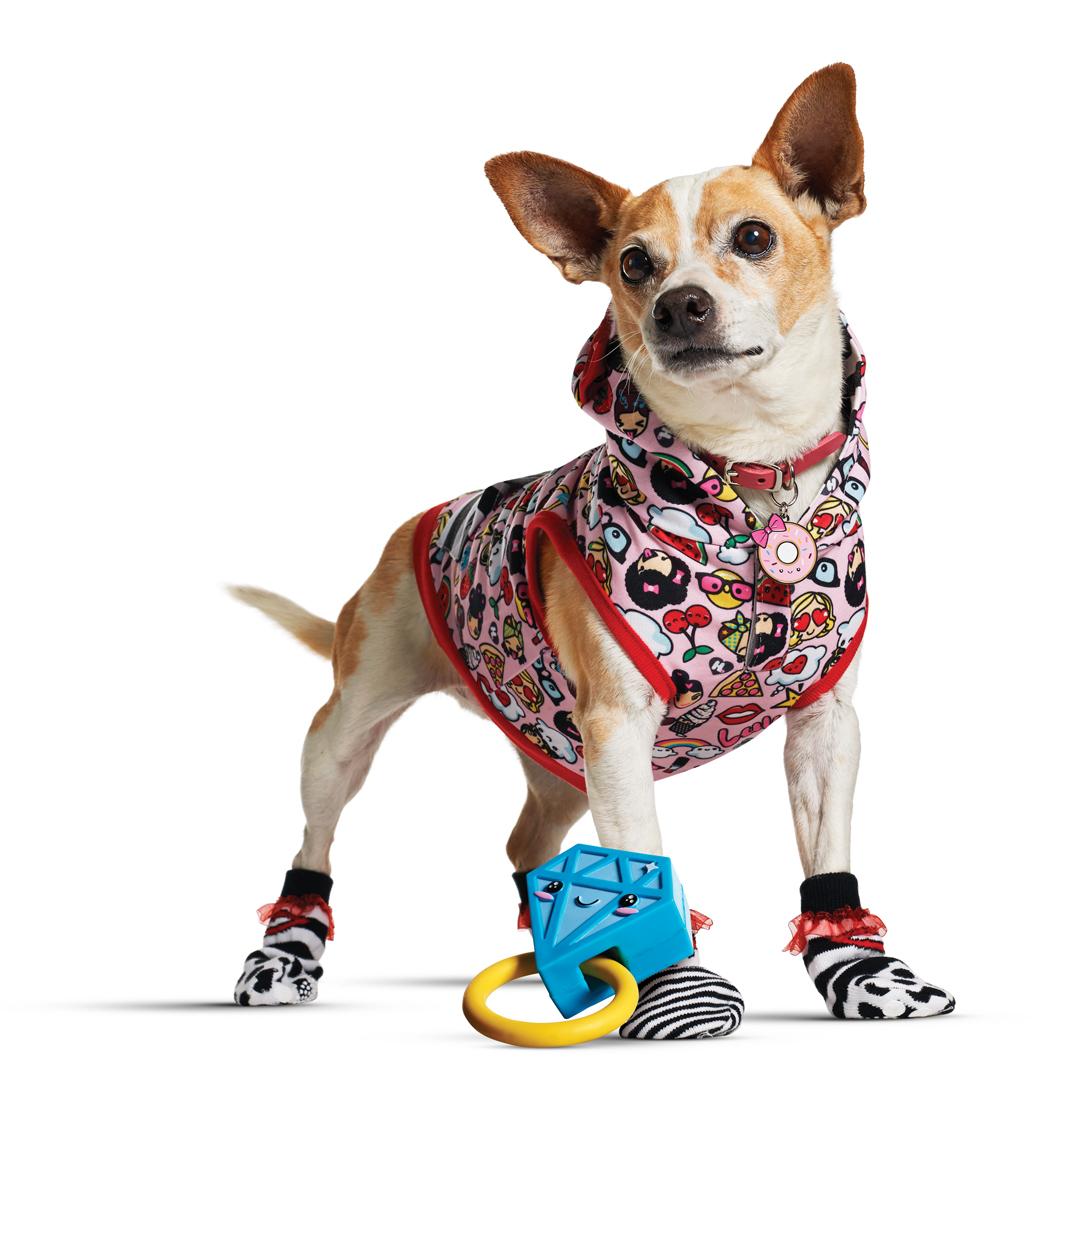 Petco - Dock Socks Harajuku Lovers Bling Emoji Dog Toy